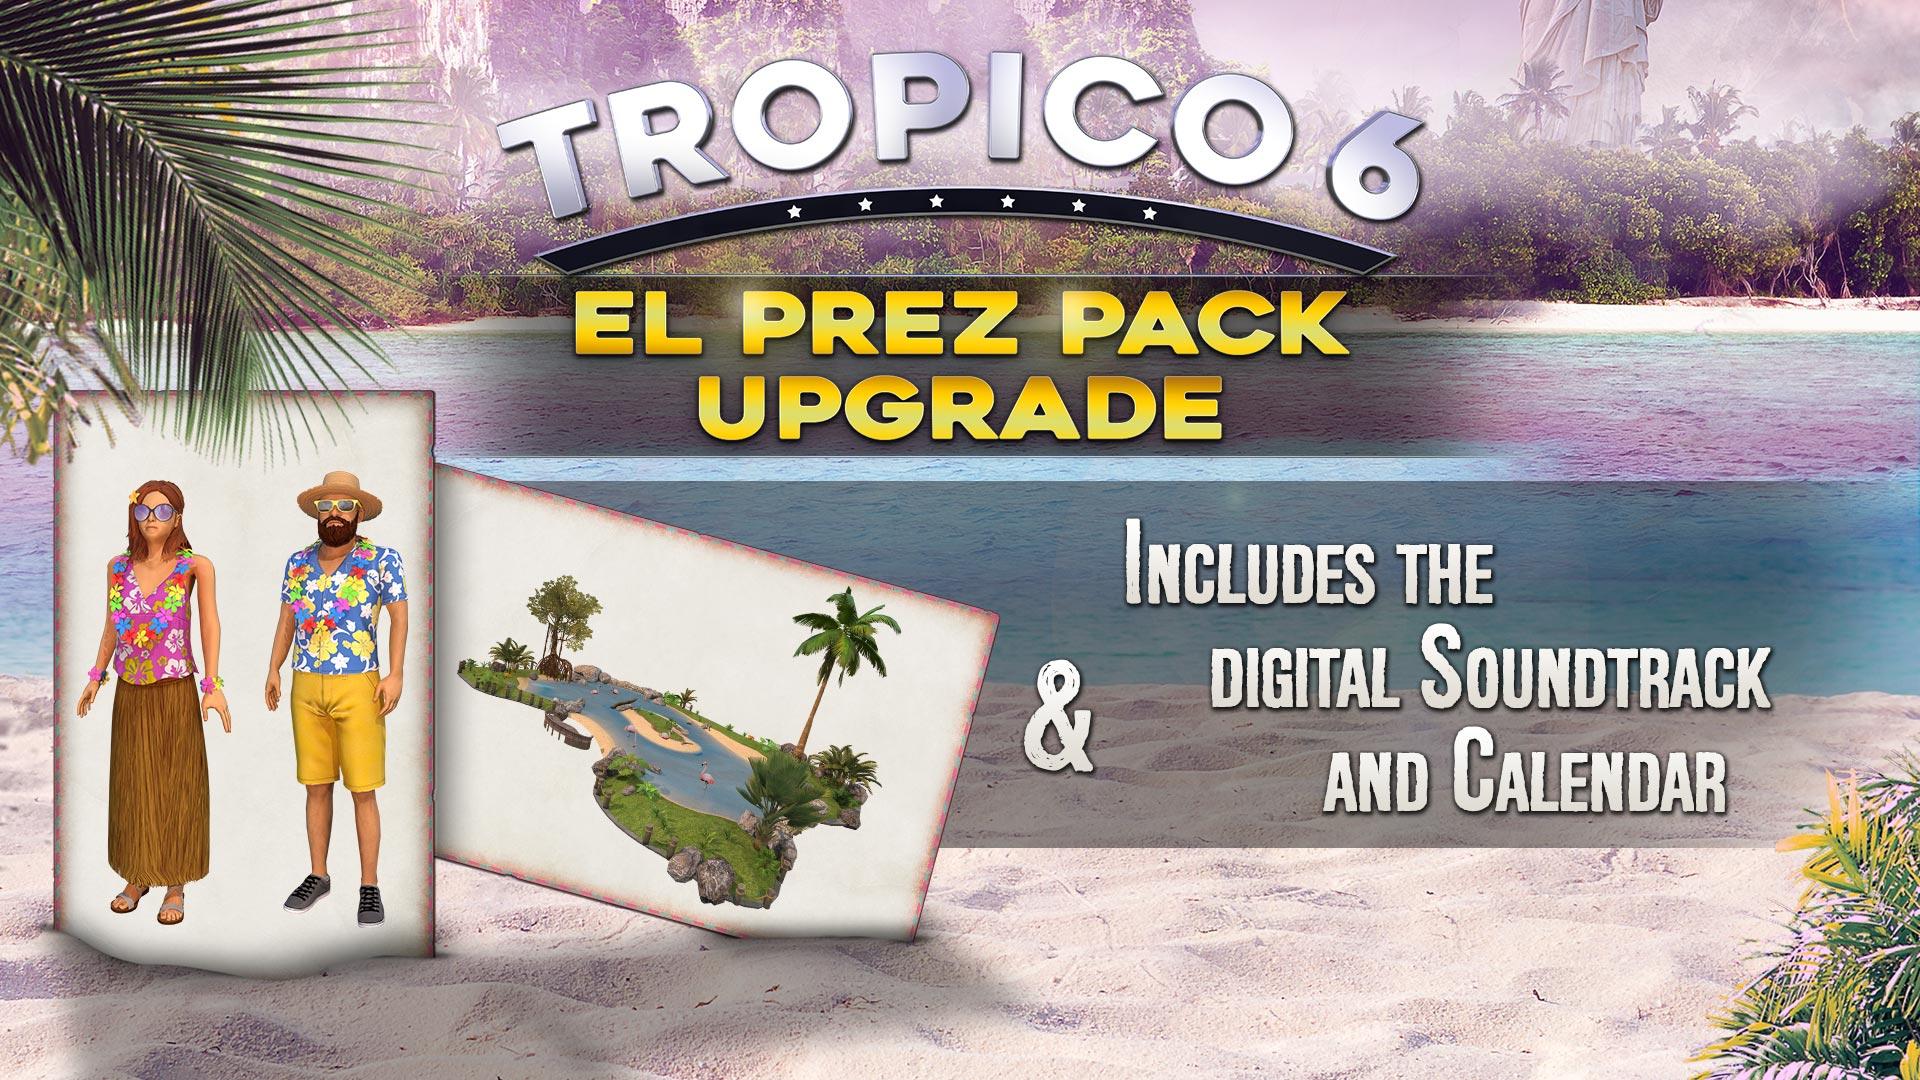 Tropico6_ElPrezPack-TITLED-HERO-ART-1920x1080UM4xGfpmFrh9H